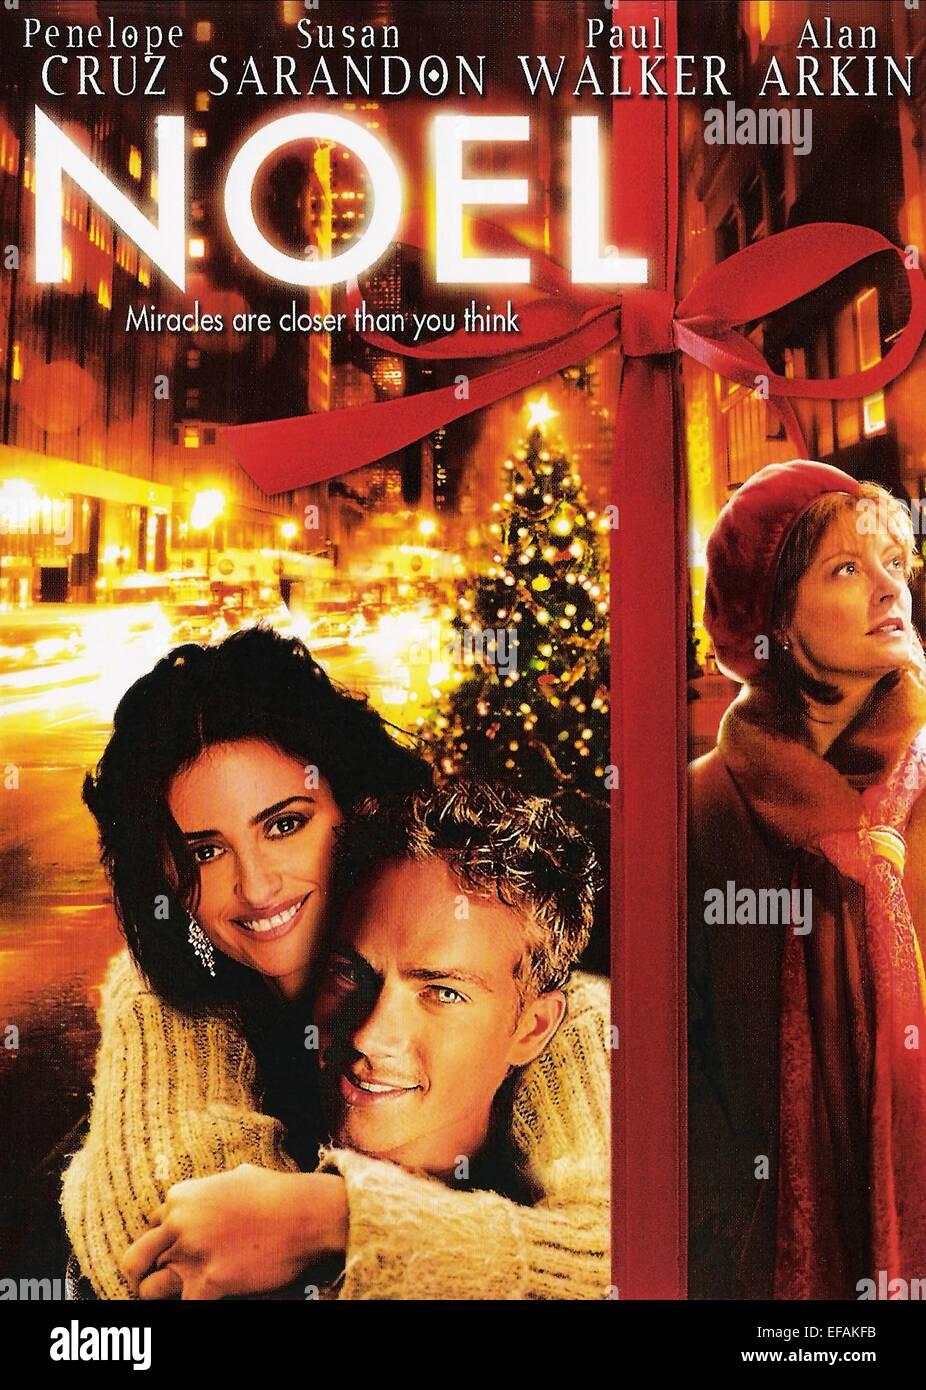 NOEL affiche de film (2004) Photo Stock